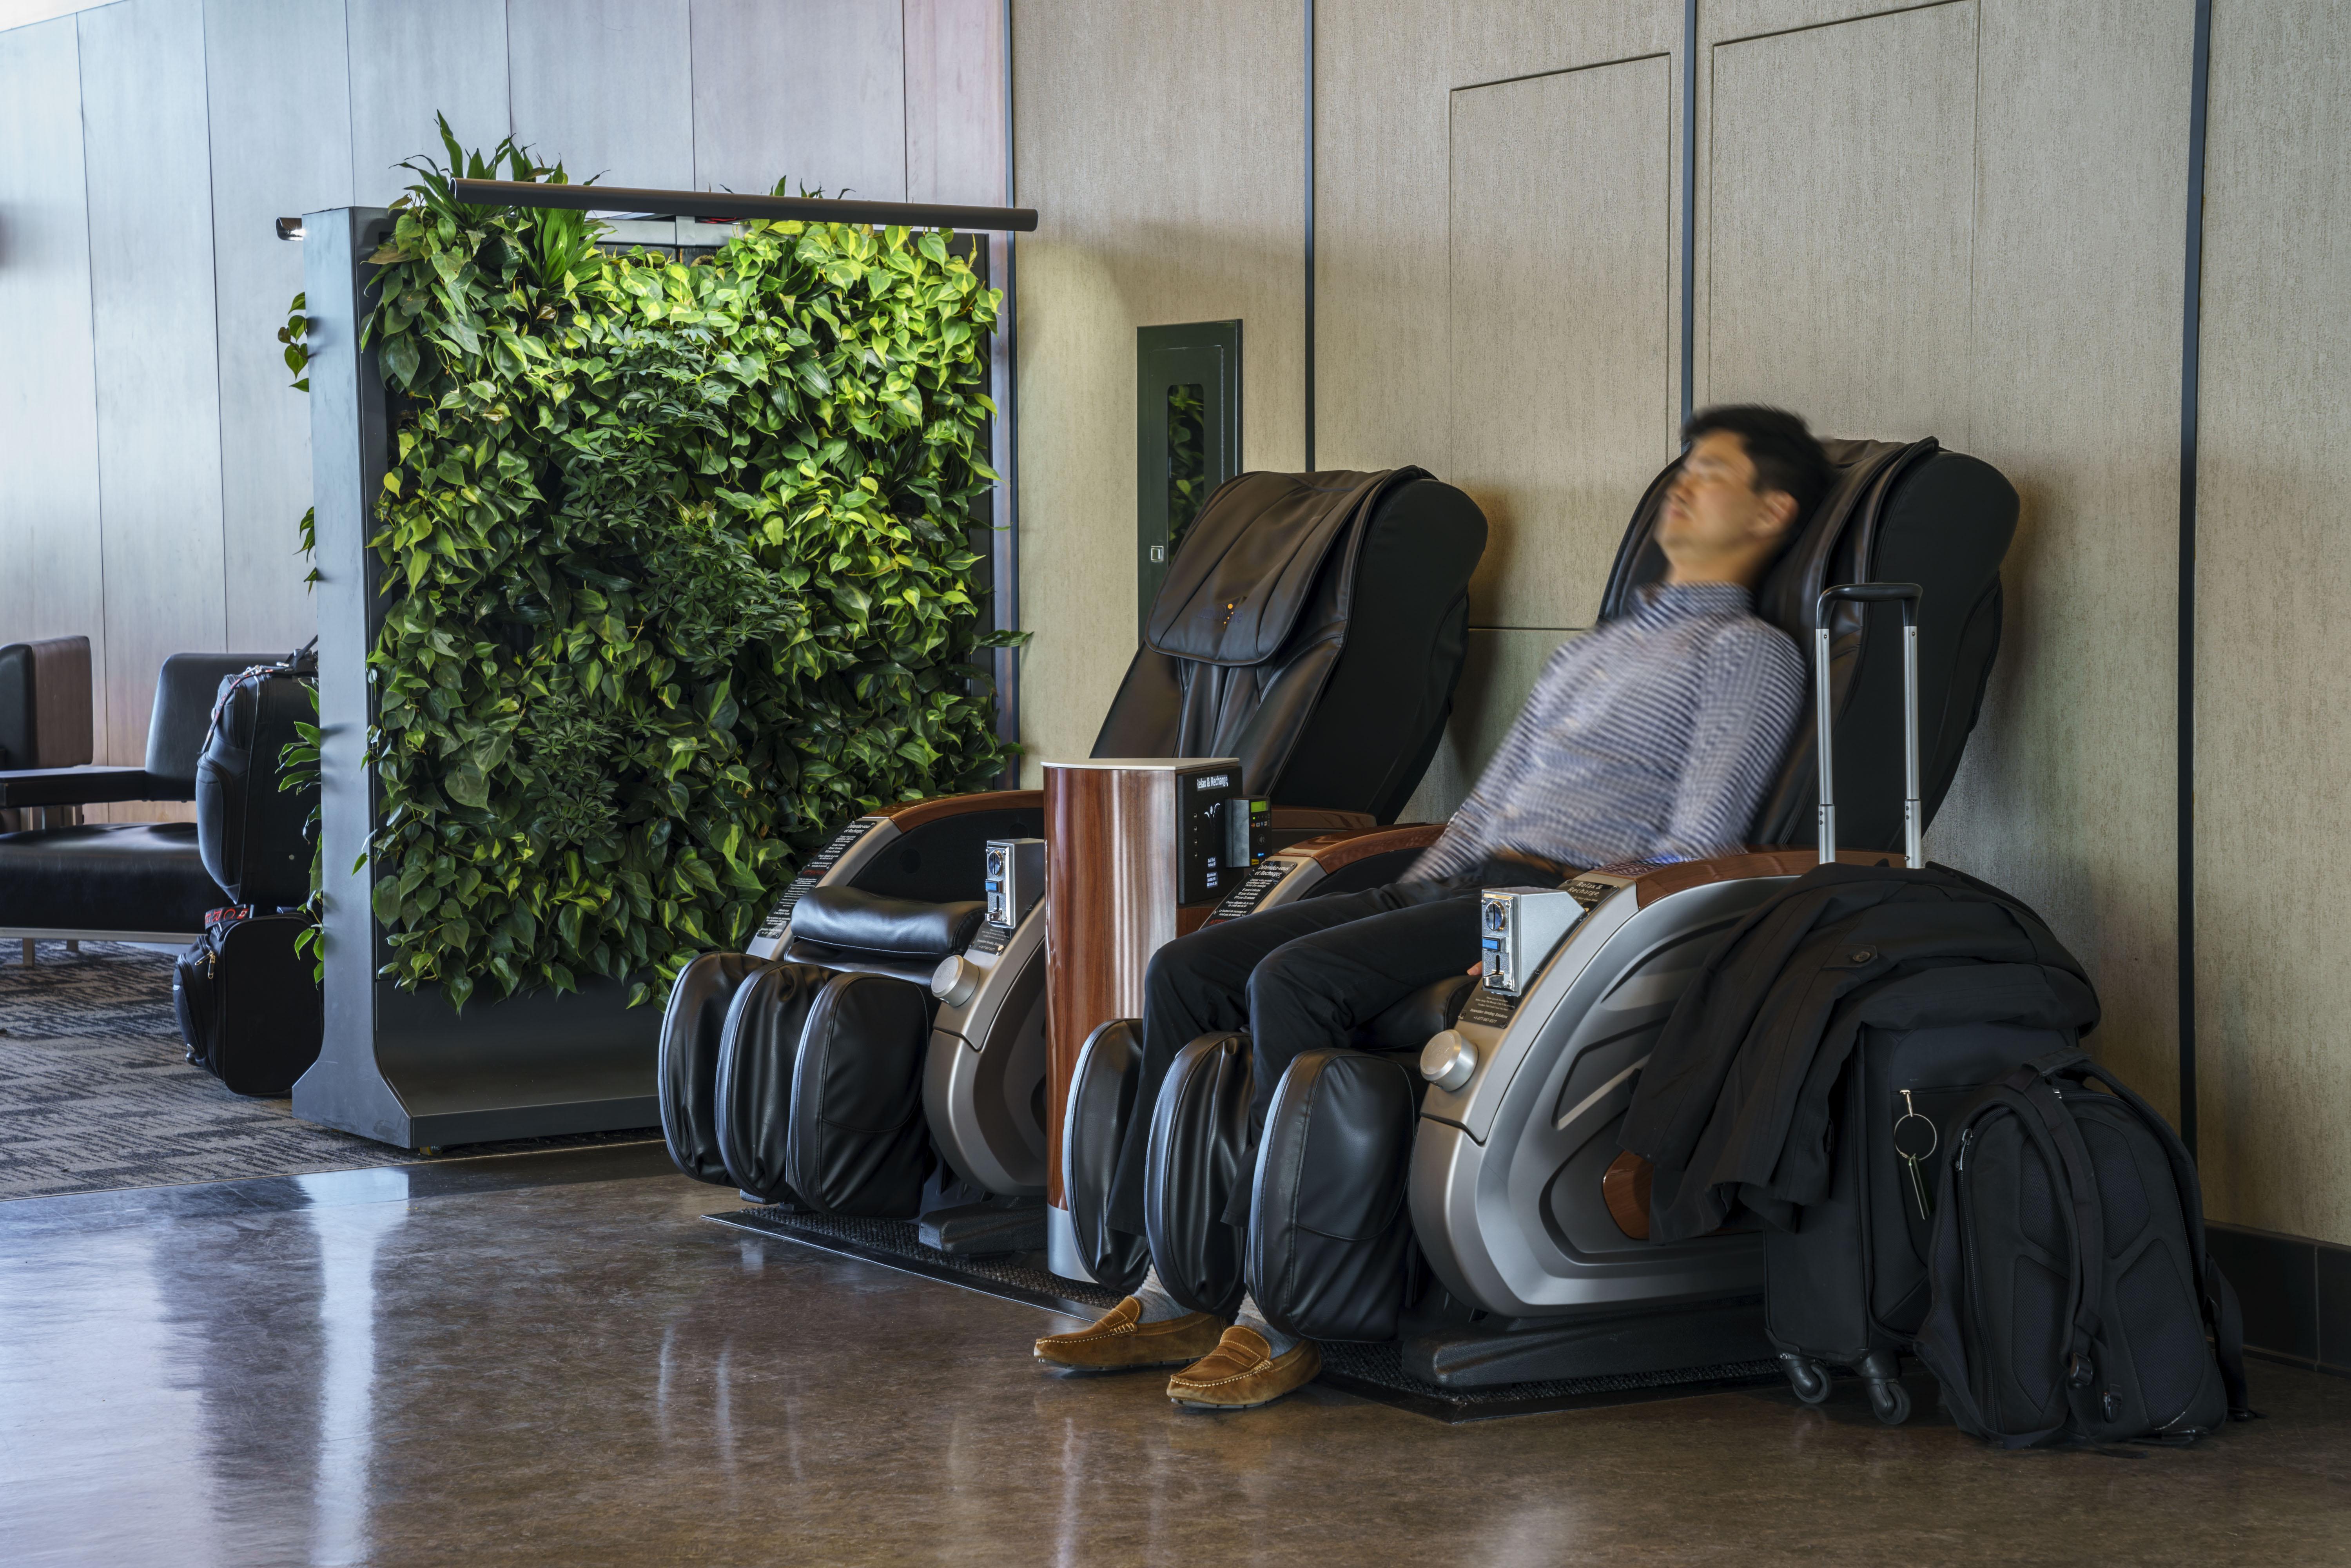 De Trudeau Fauteuils Montréal International – Massage Aéroport CdeBrxo